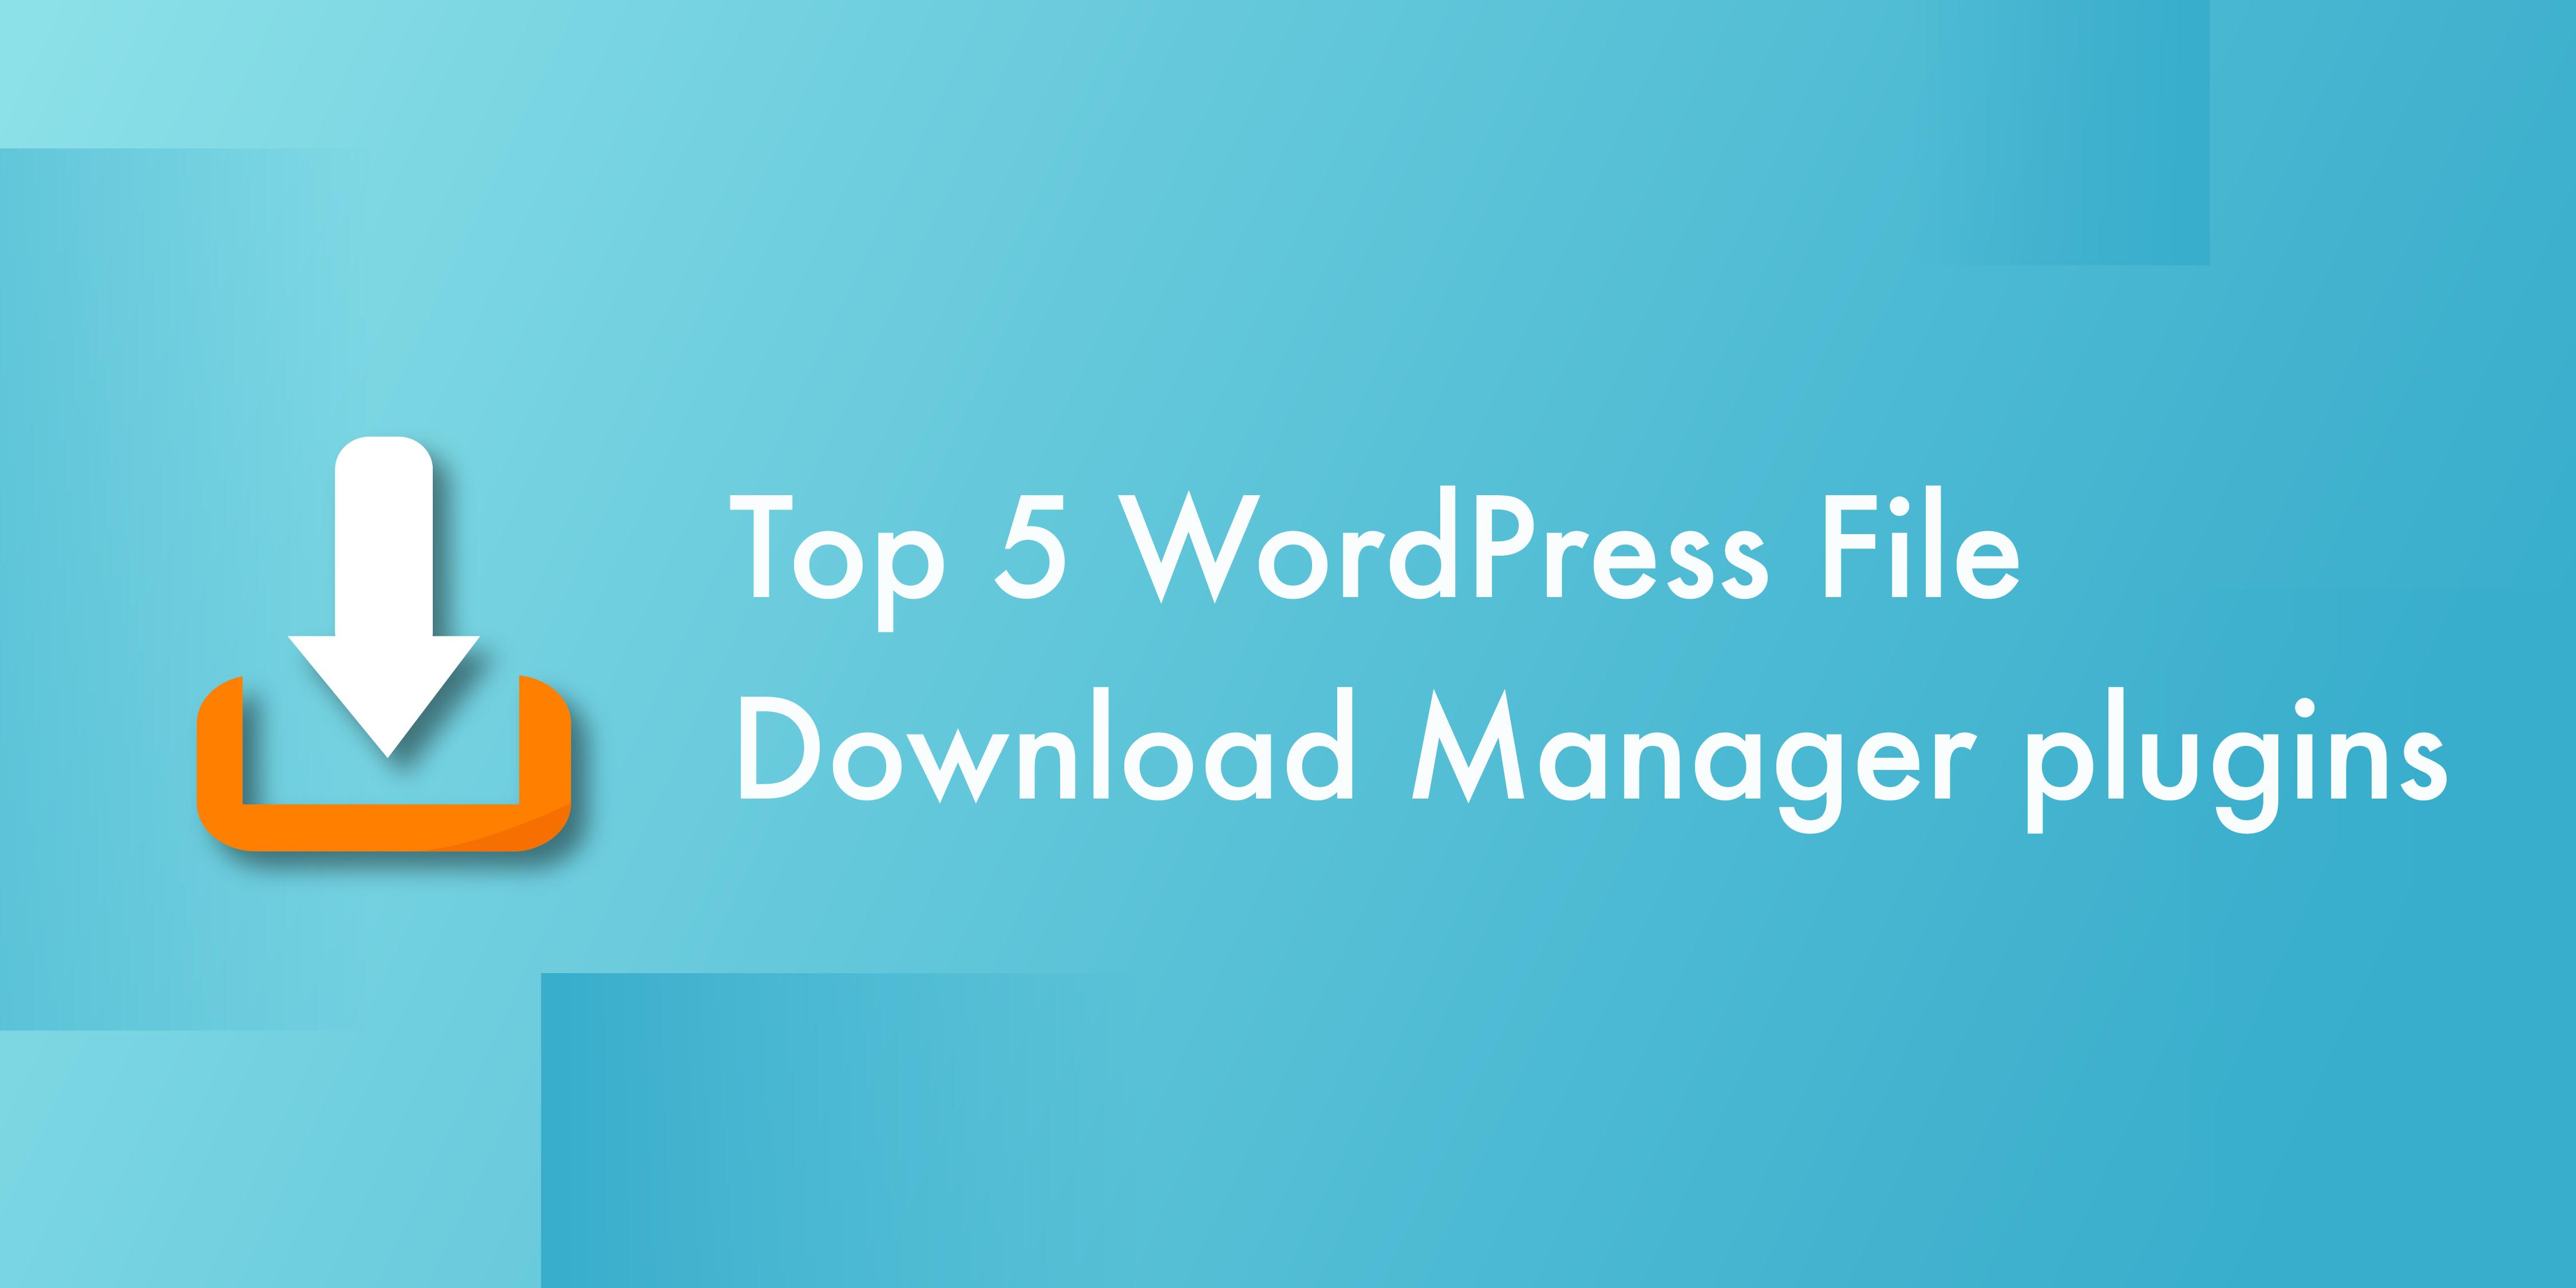 Top 5 WordPress File Download Manager plugins - WPOven Blog